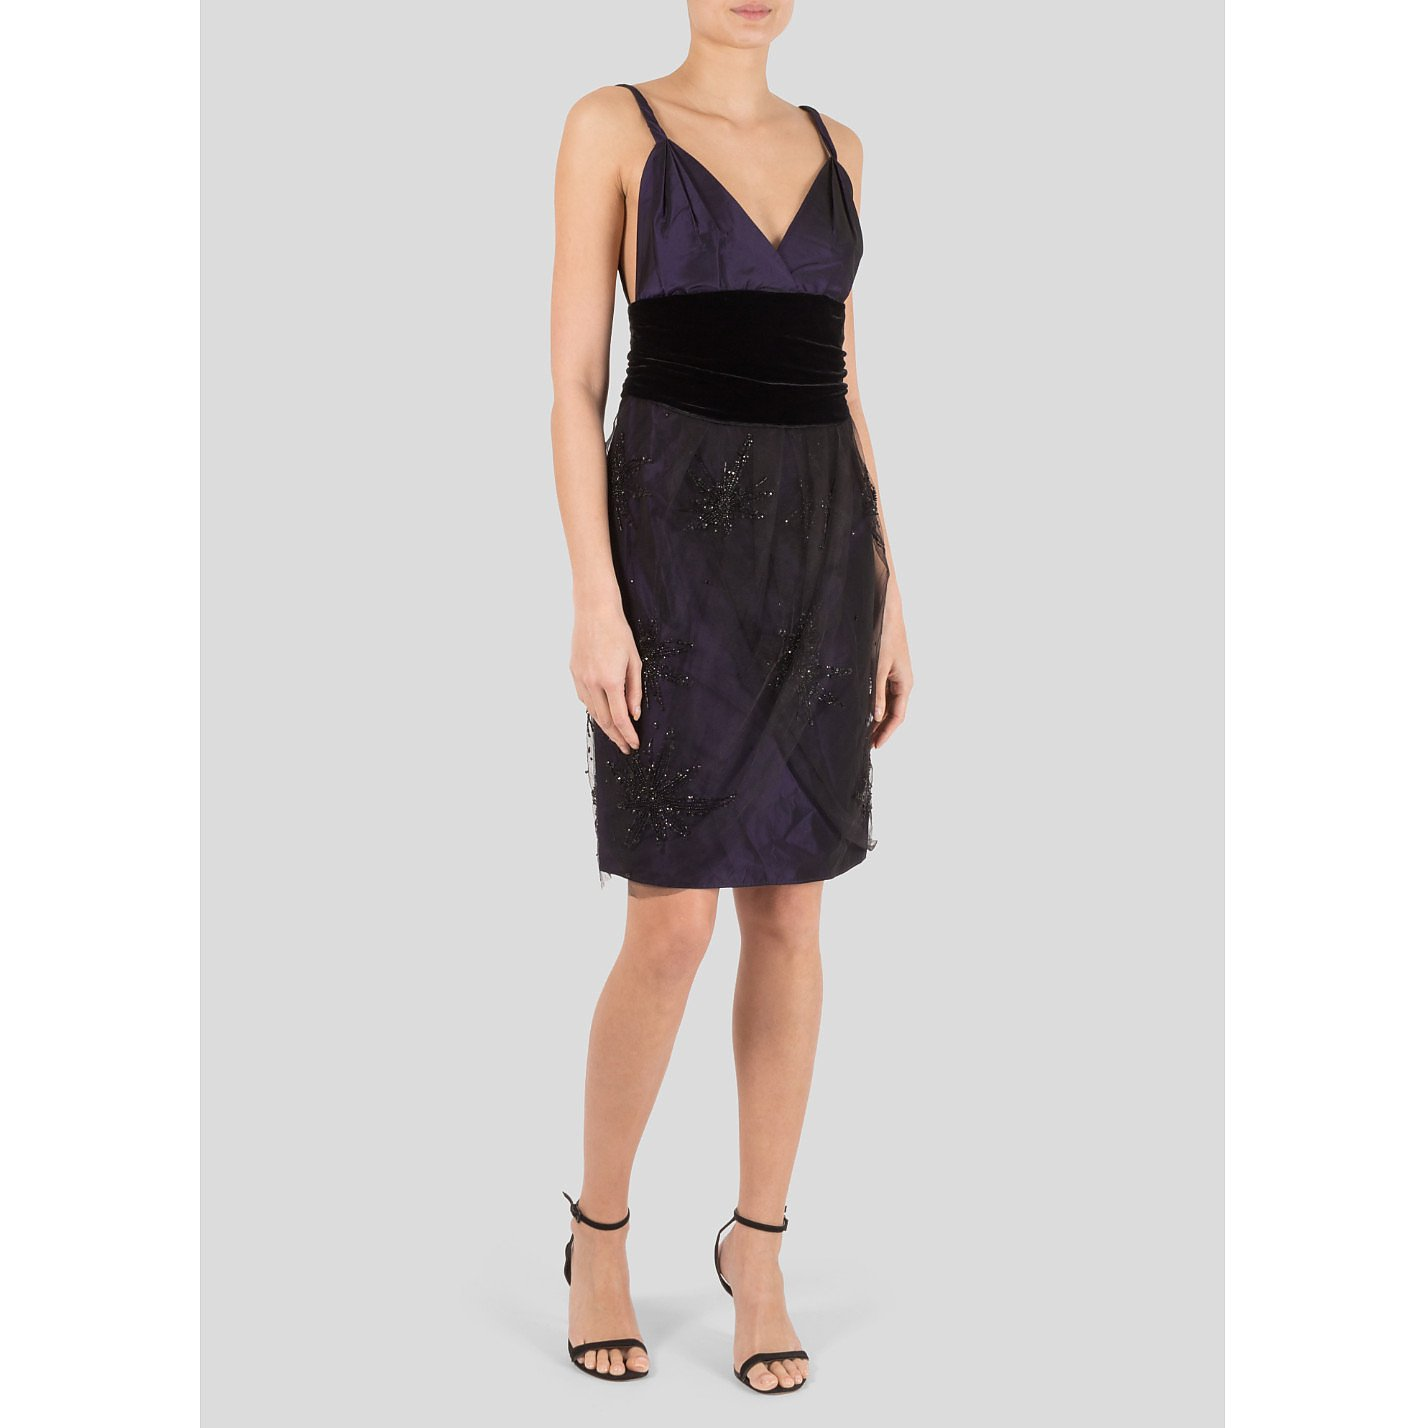 Emporio Armani Embellished Tulle And Velvet Dress